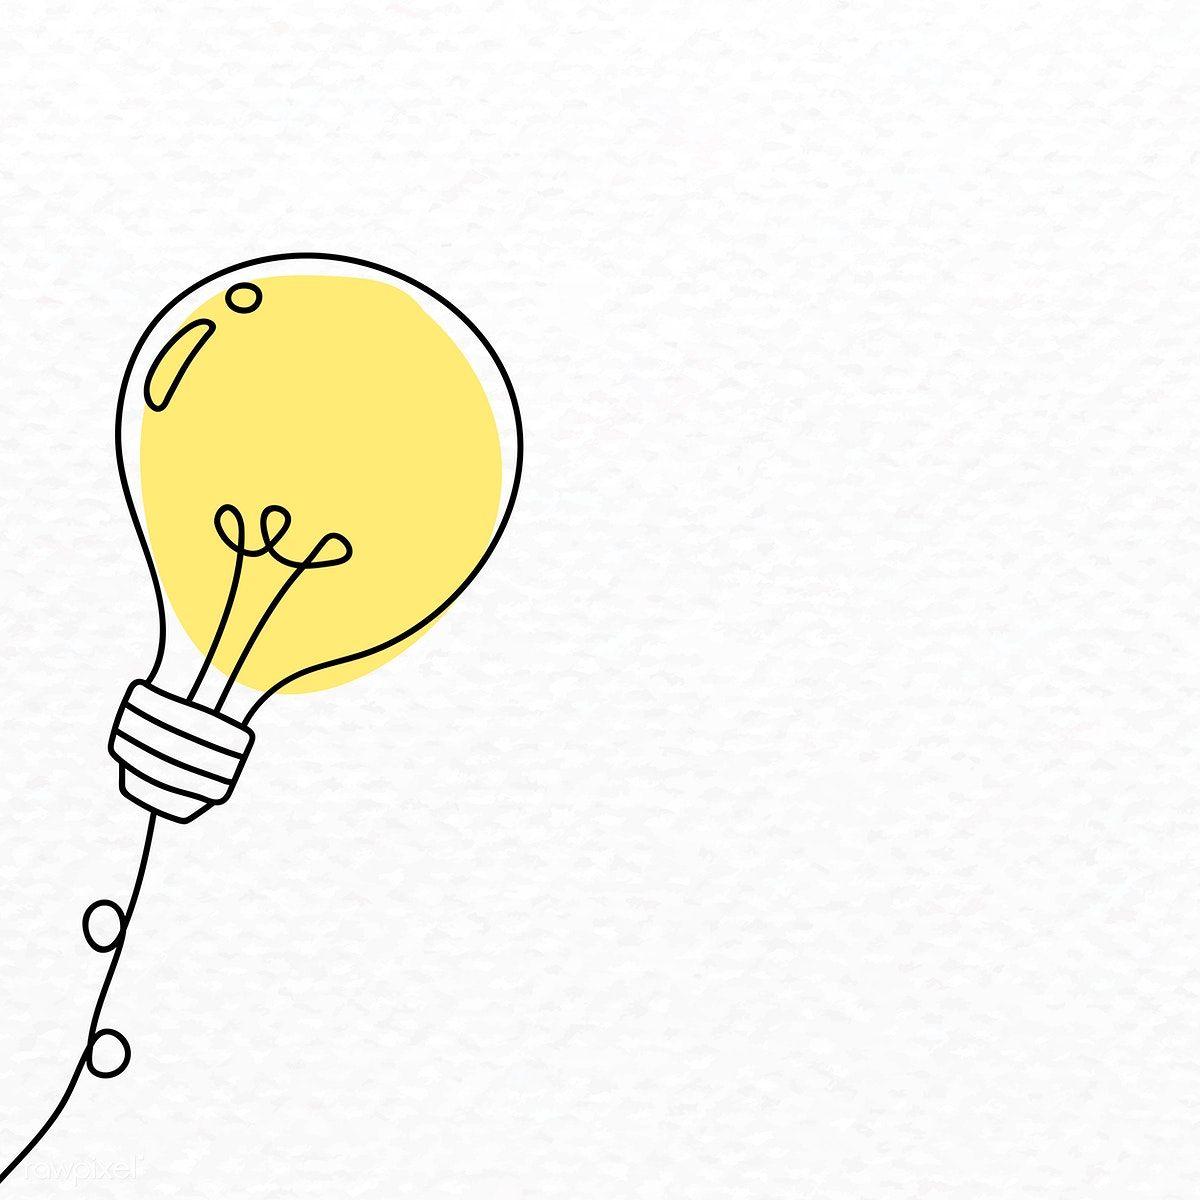 Creative Light Bulb Doodle Vector Free Image By Rawpixel Com Vector Vectoart Digitalpainting Digitalarti Vector Free Powerpoint Background Design Doodles